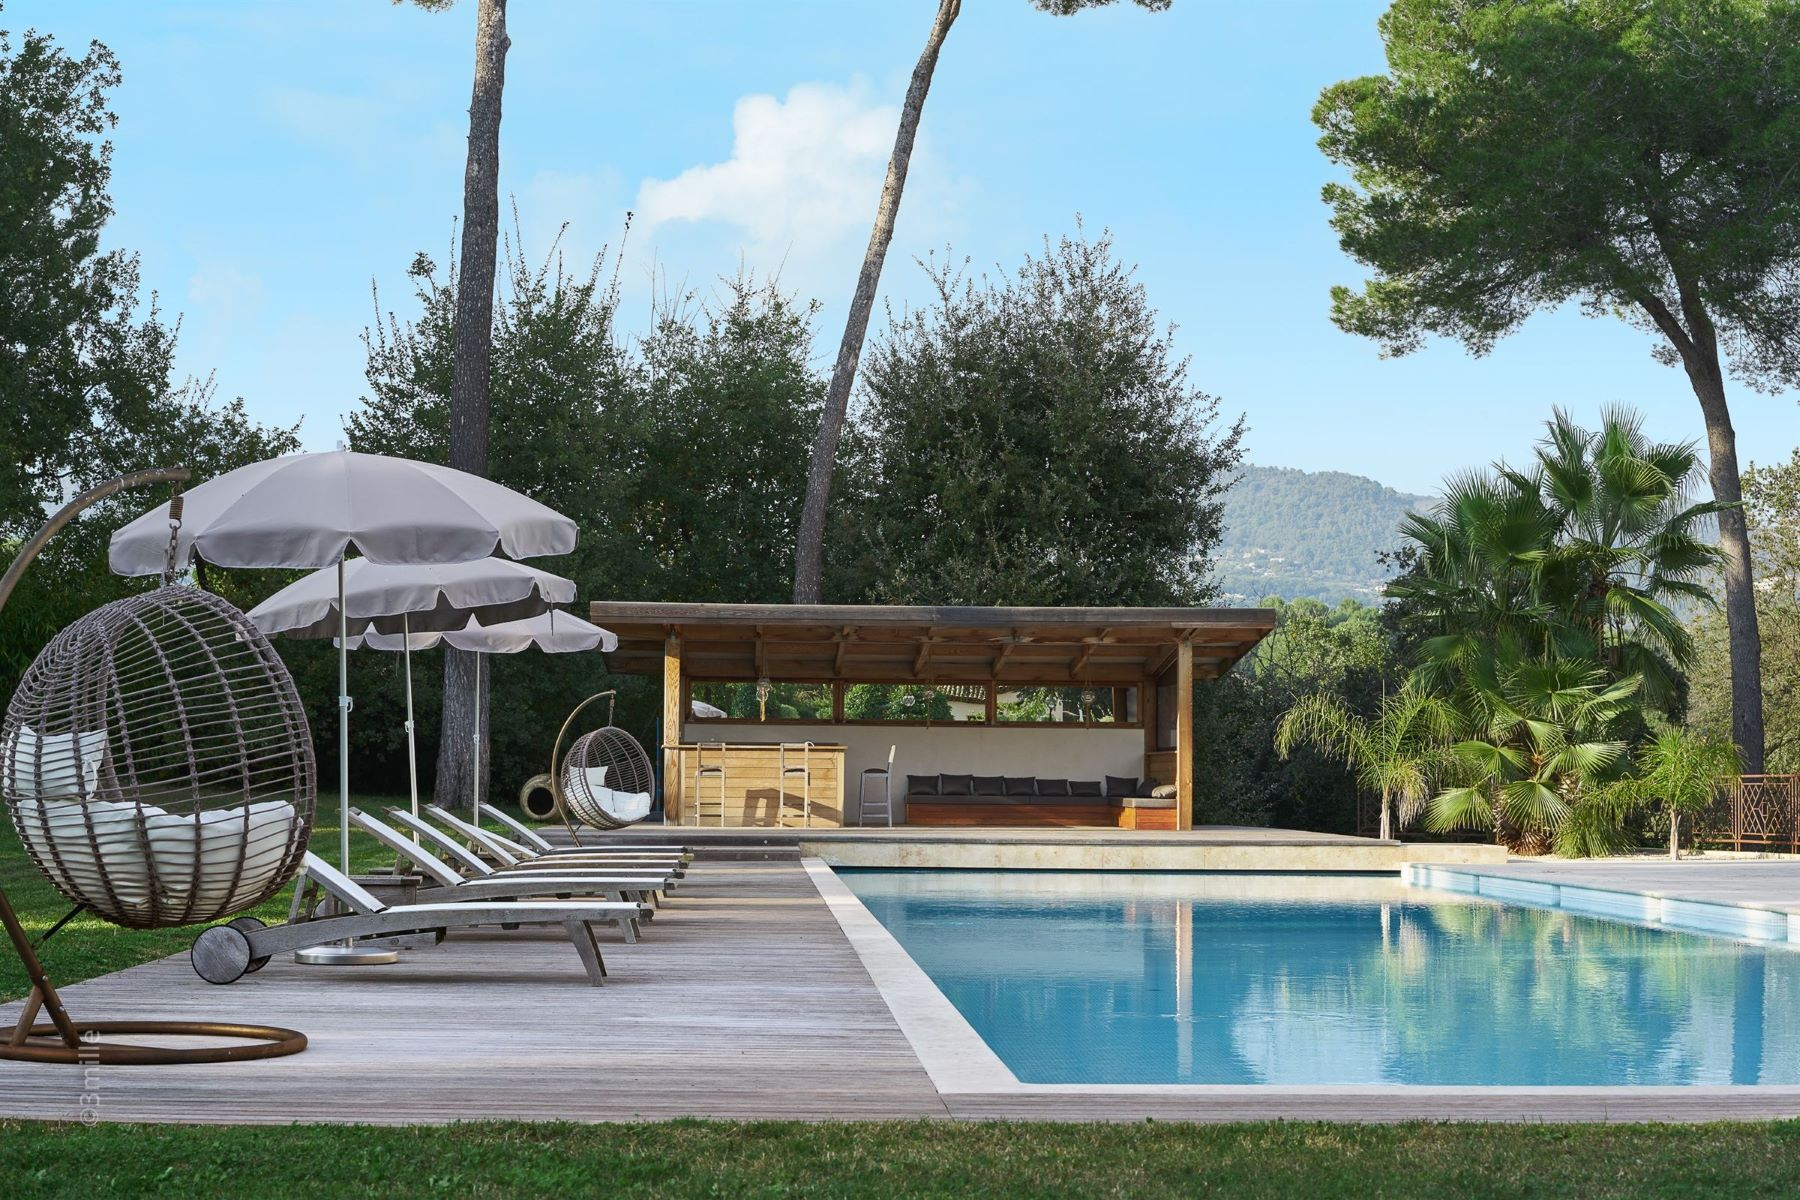 Single Family Homes por un Venta en For sale - Luxurious villa in Saint-Paul-de-Vence Other Provence-Alpes-Cote D'Azur, Provincia - Alpes - Costa Azul 06570 Francia